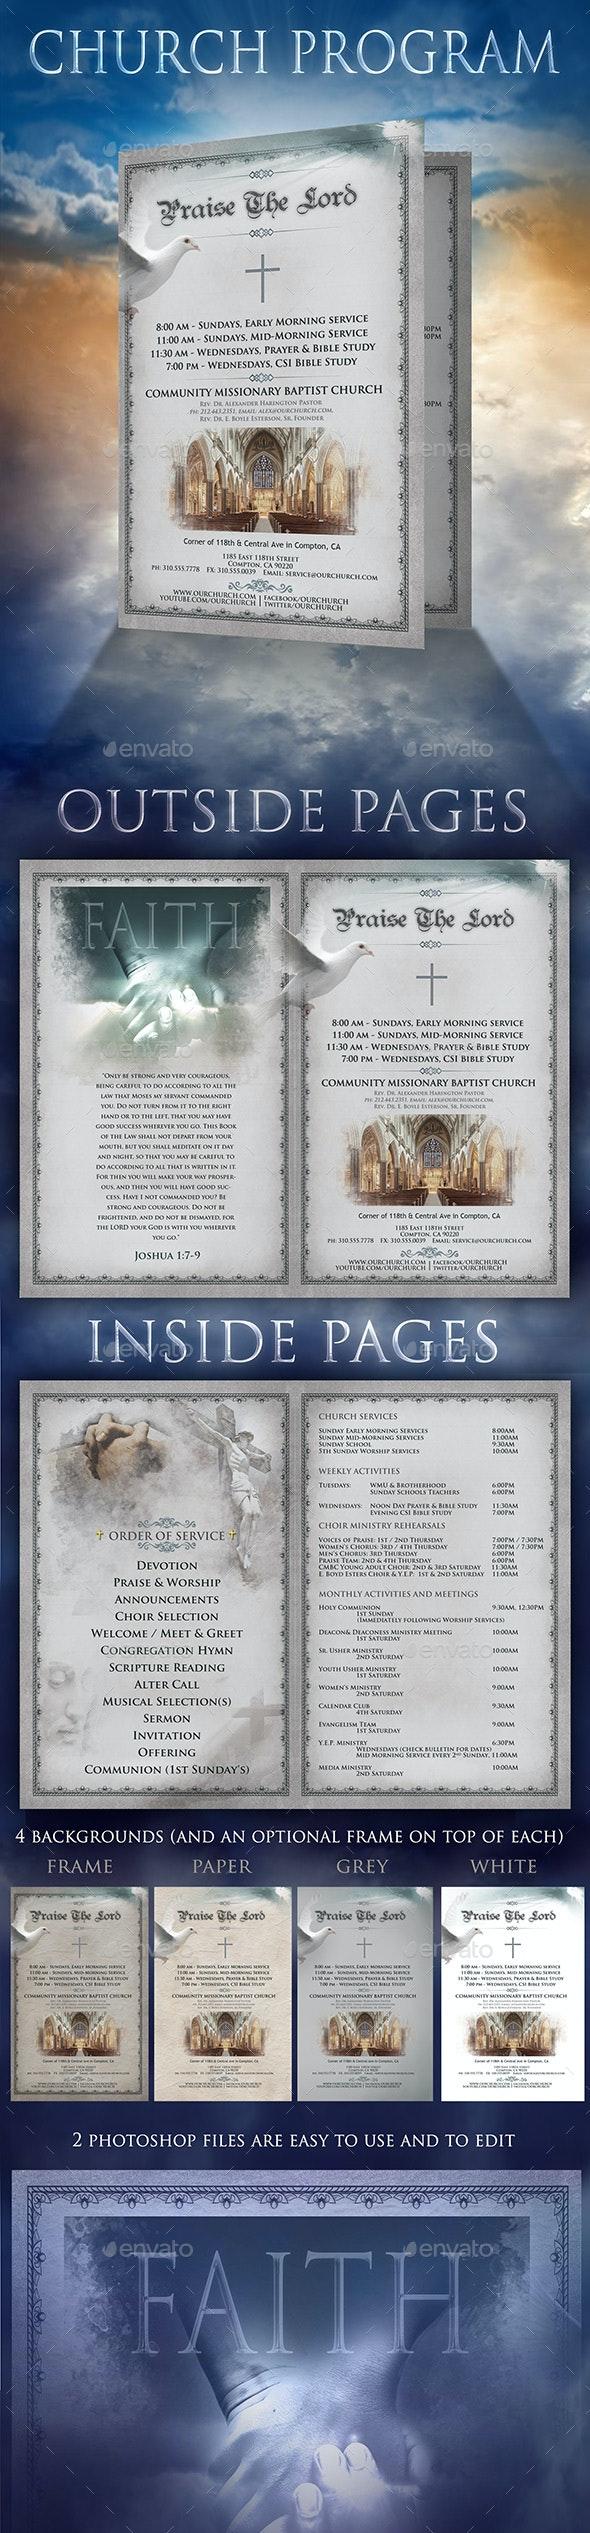 Church Program 2 page Brochure - Church Flyers